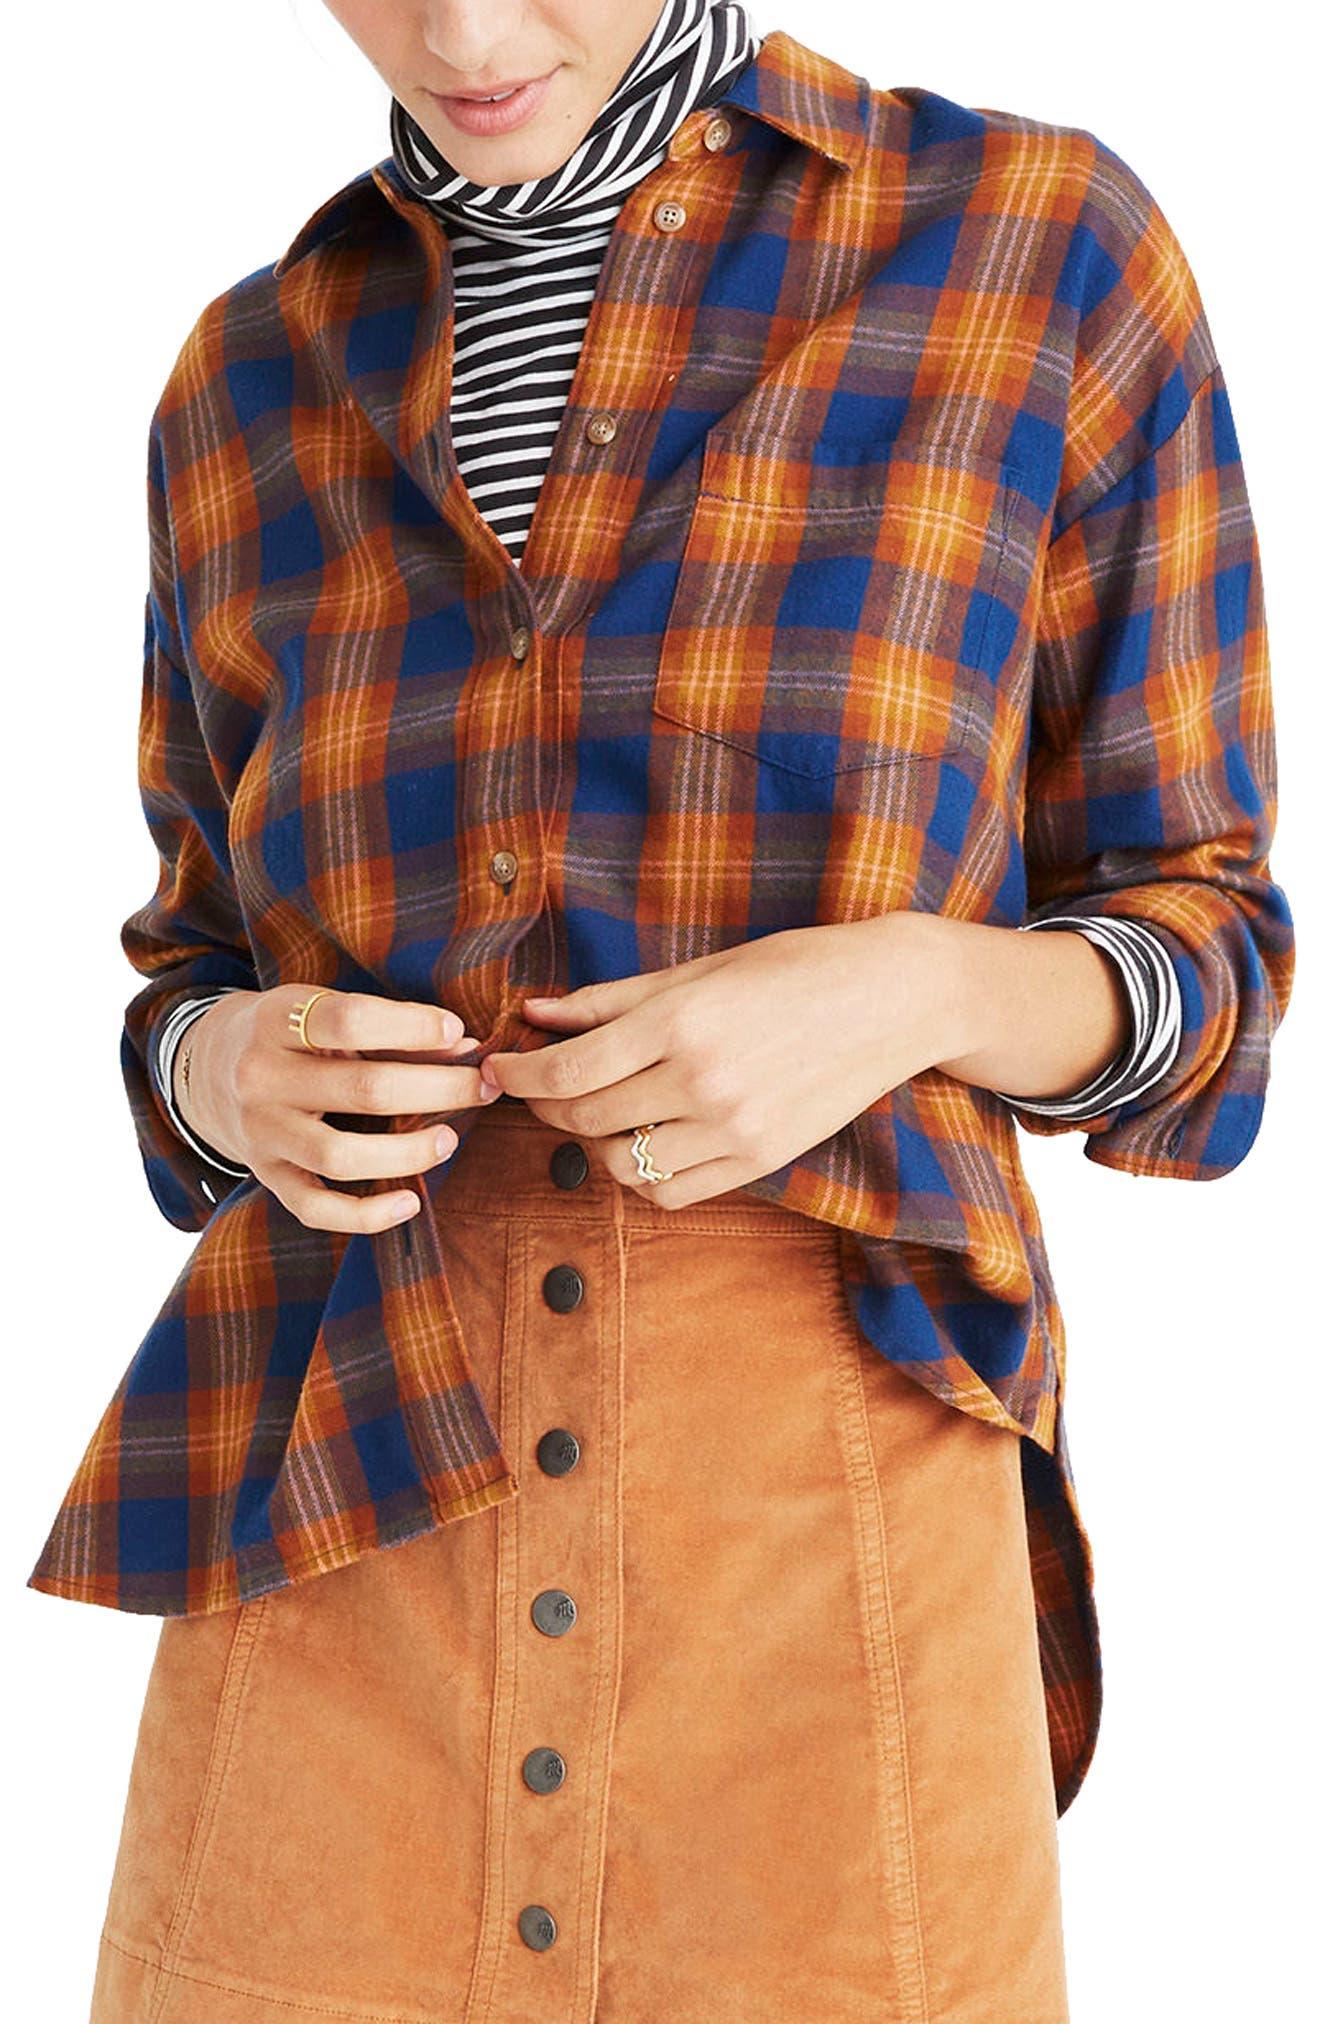 Alternate Image 1 Selected - Madewell Westward Ardan Plaid Shirt